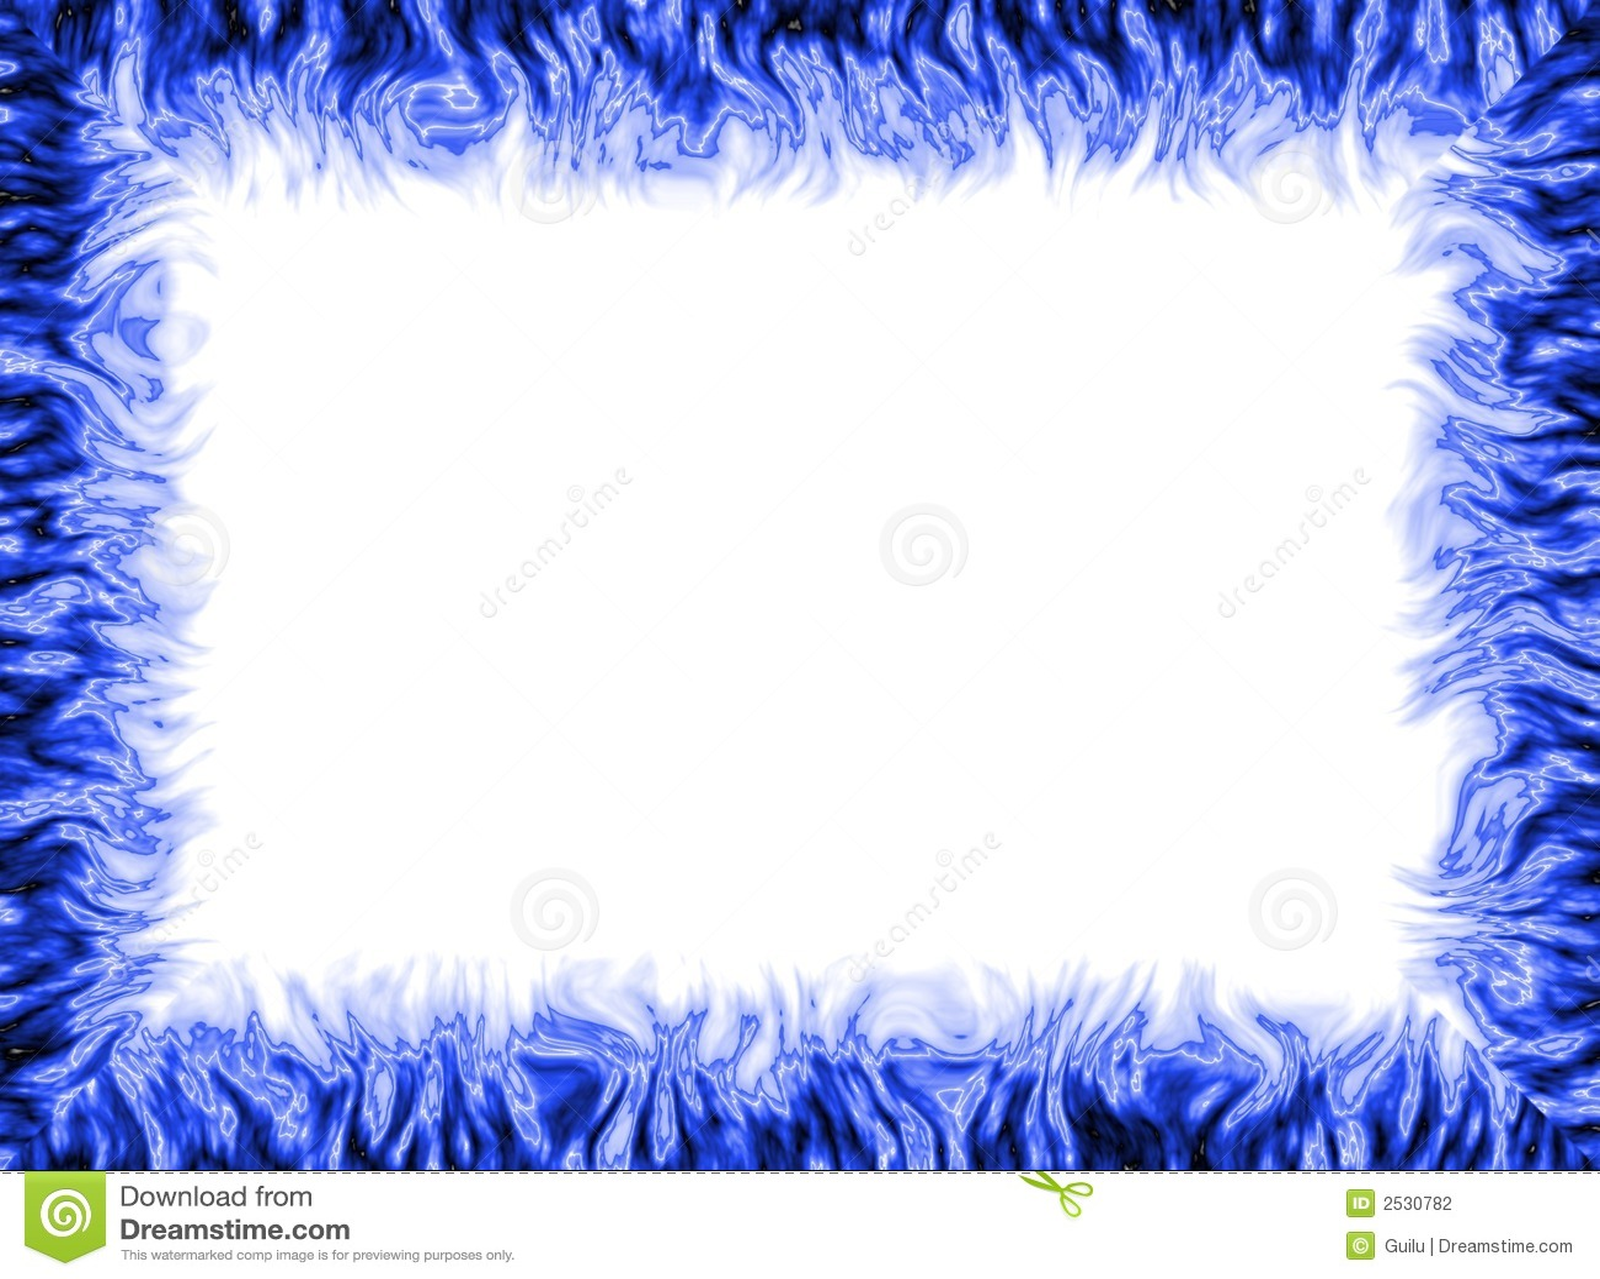 Blue Frame Stock Photography - Image: 2530782